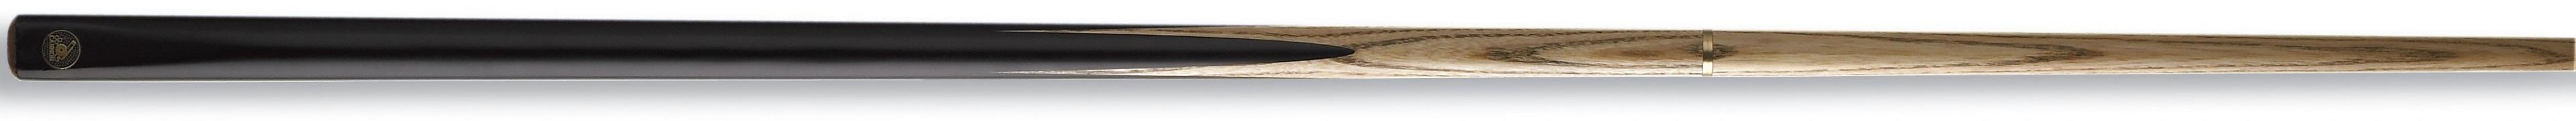 Tac snooker Peradon Cannon Tornado